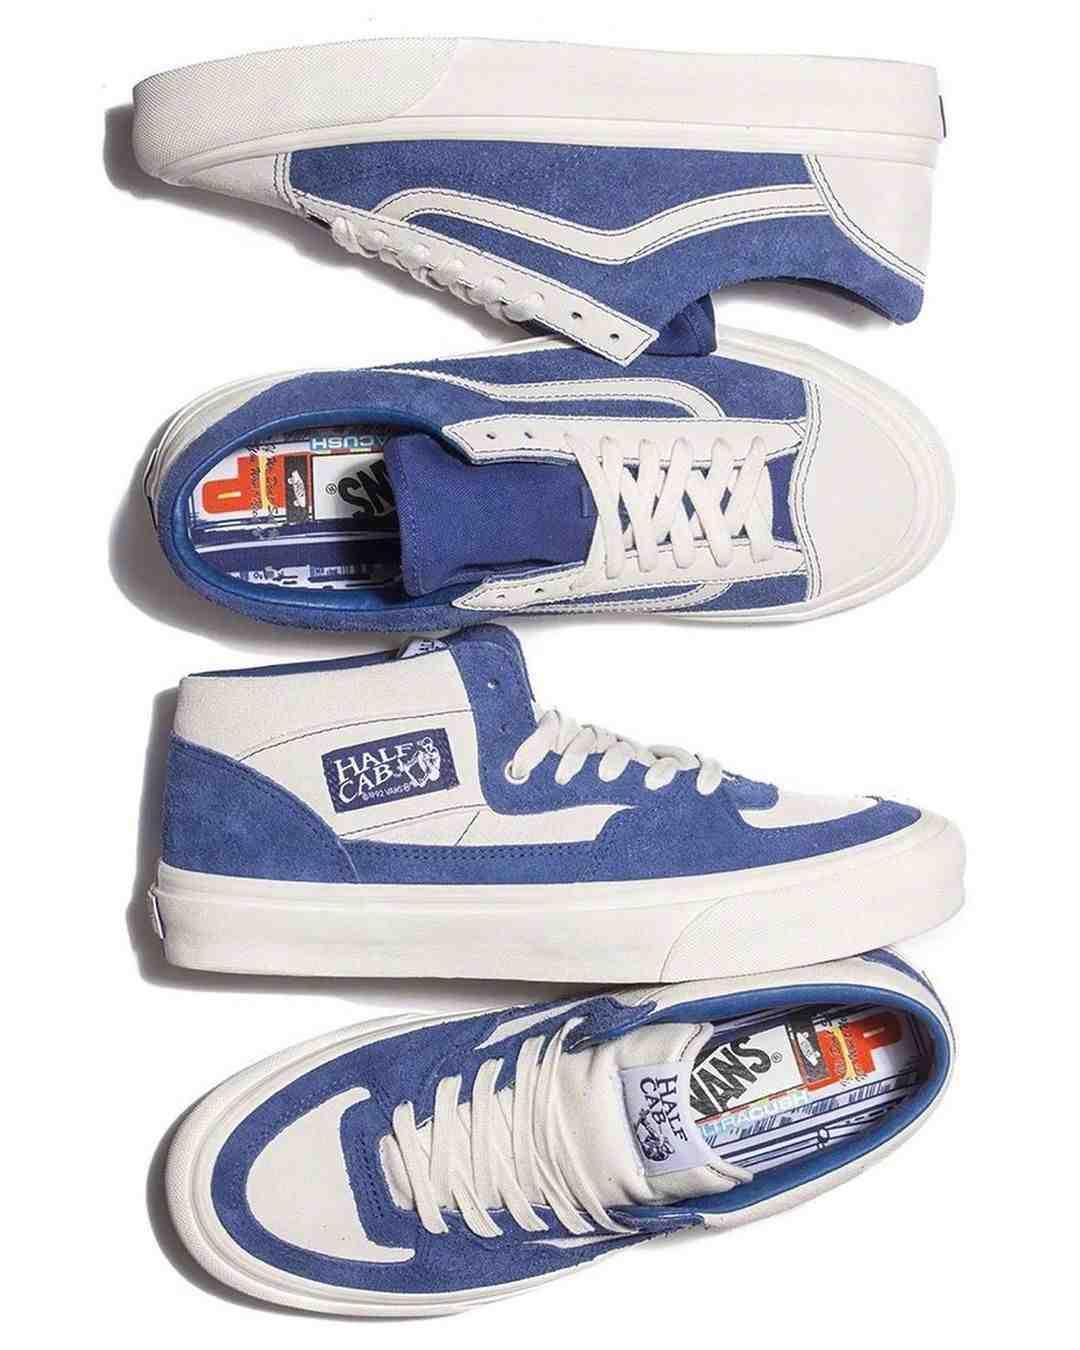 Better Gift Shop x Vans Vault 合作系列,选用蓝色和白色搭配……